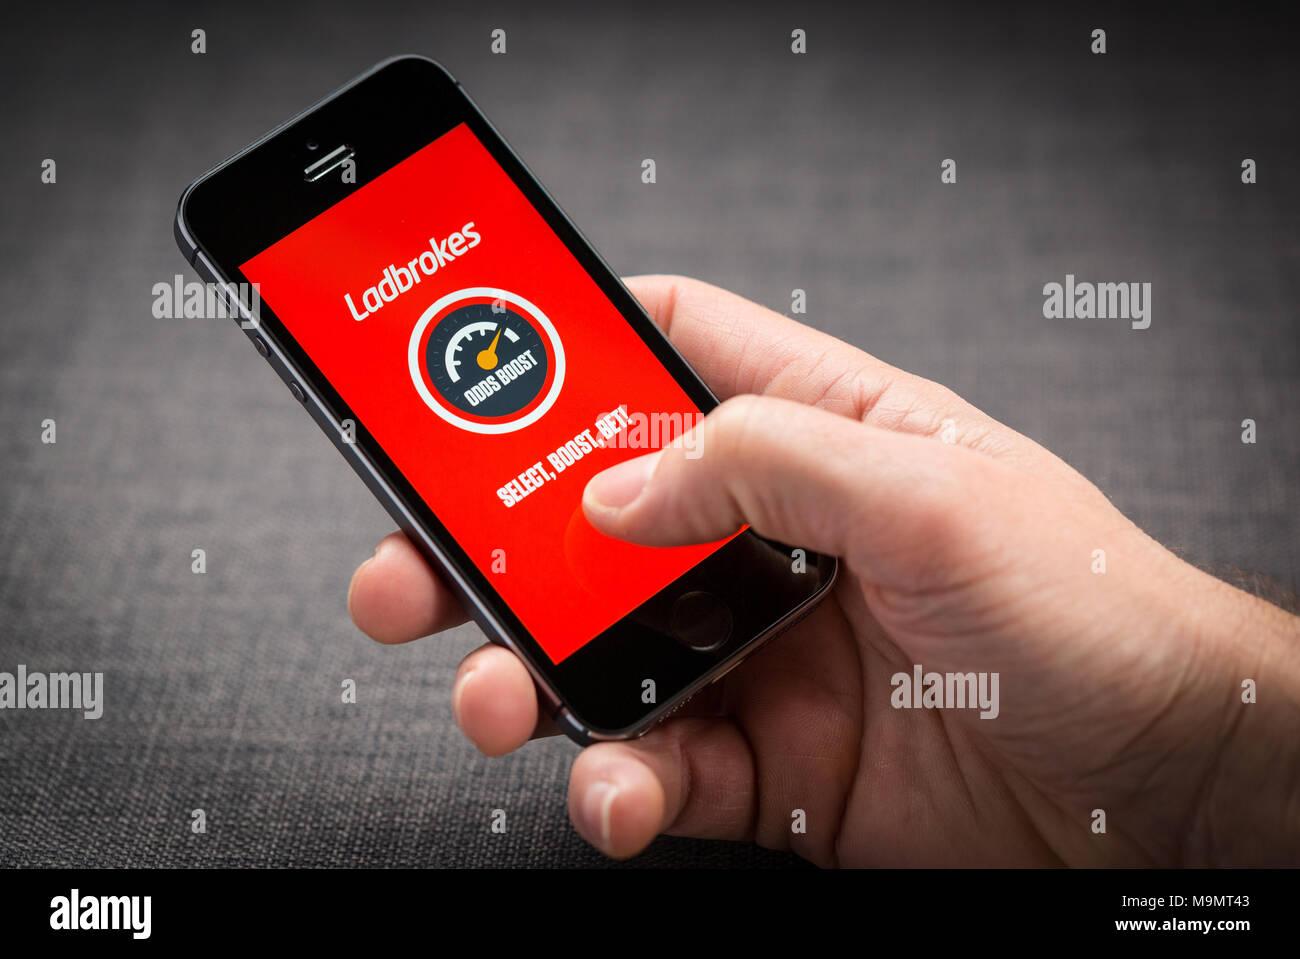 ladbroke app download